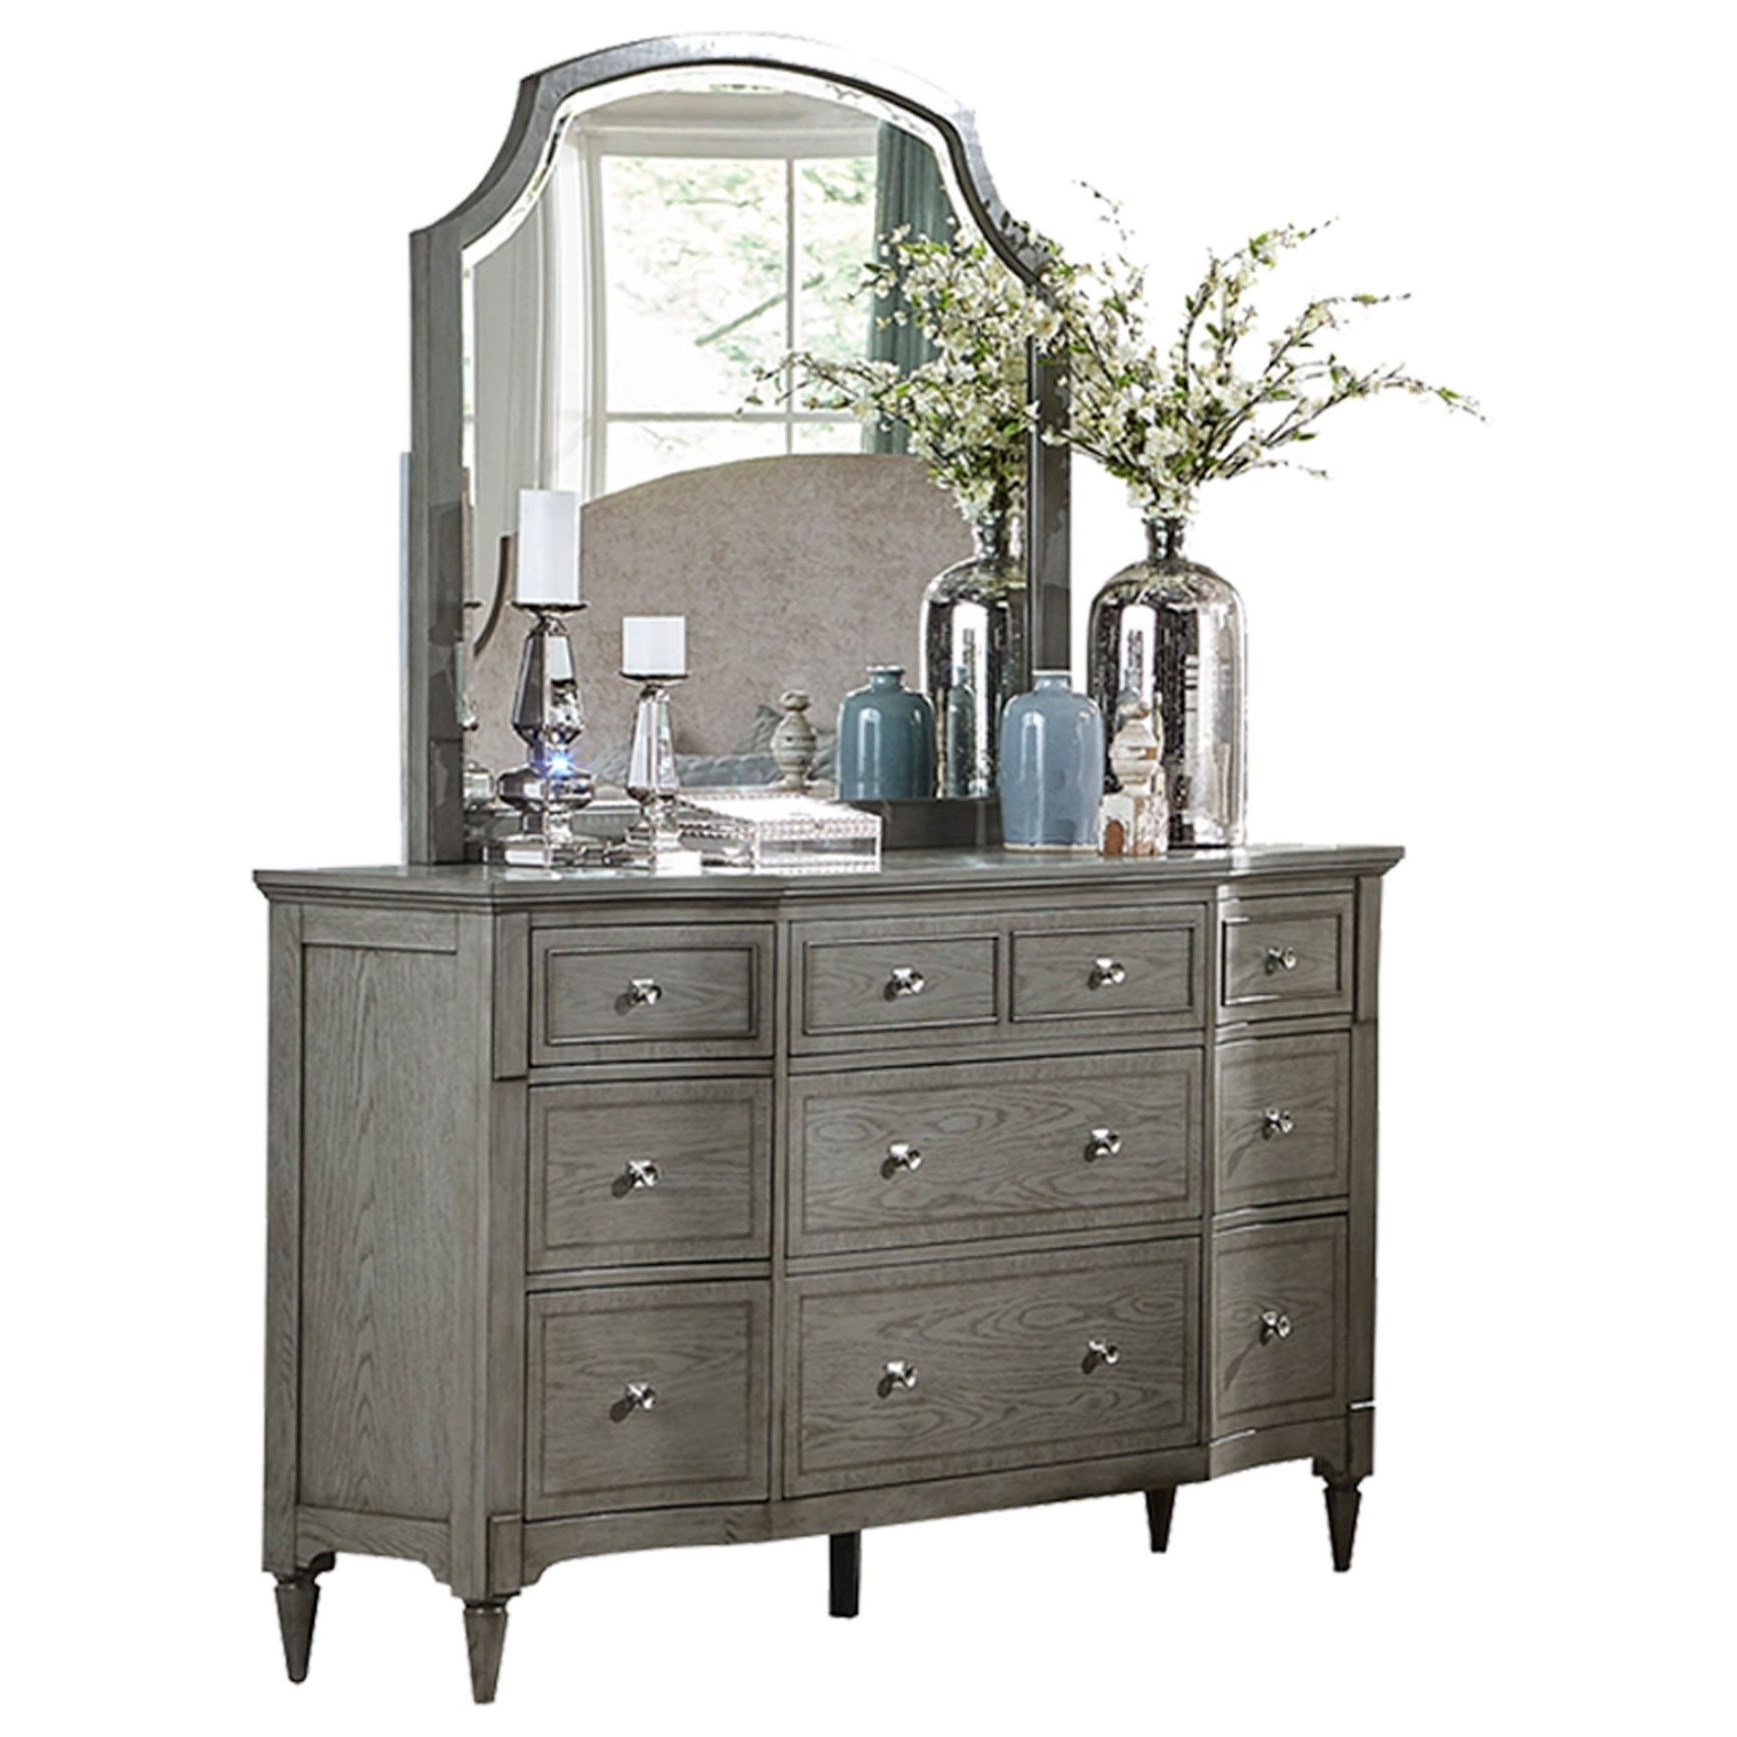 Albright Dresser and Mirror Set by Homelegance at Carolina Direct